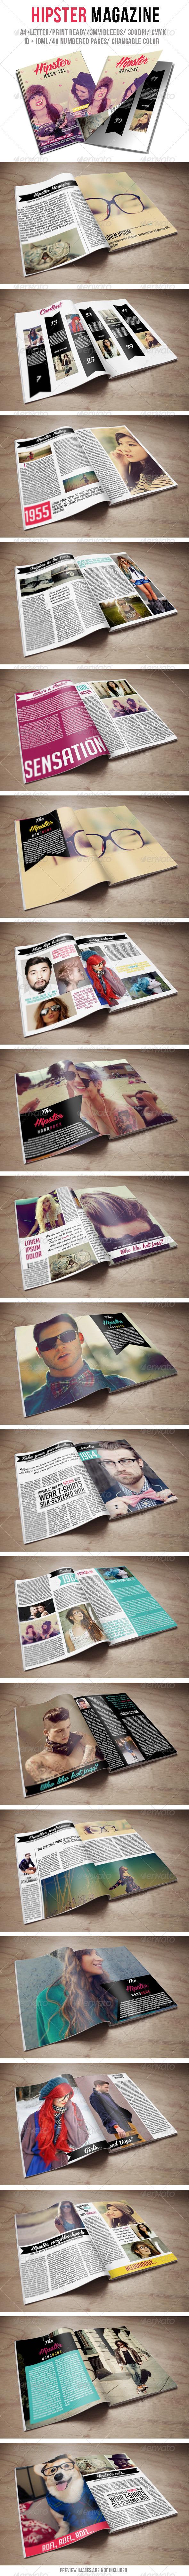 Hipster Magazine - Magazines Print Templates